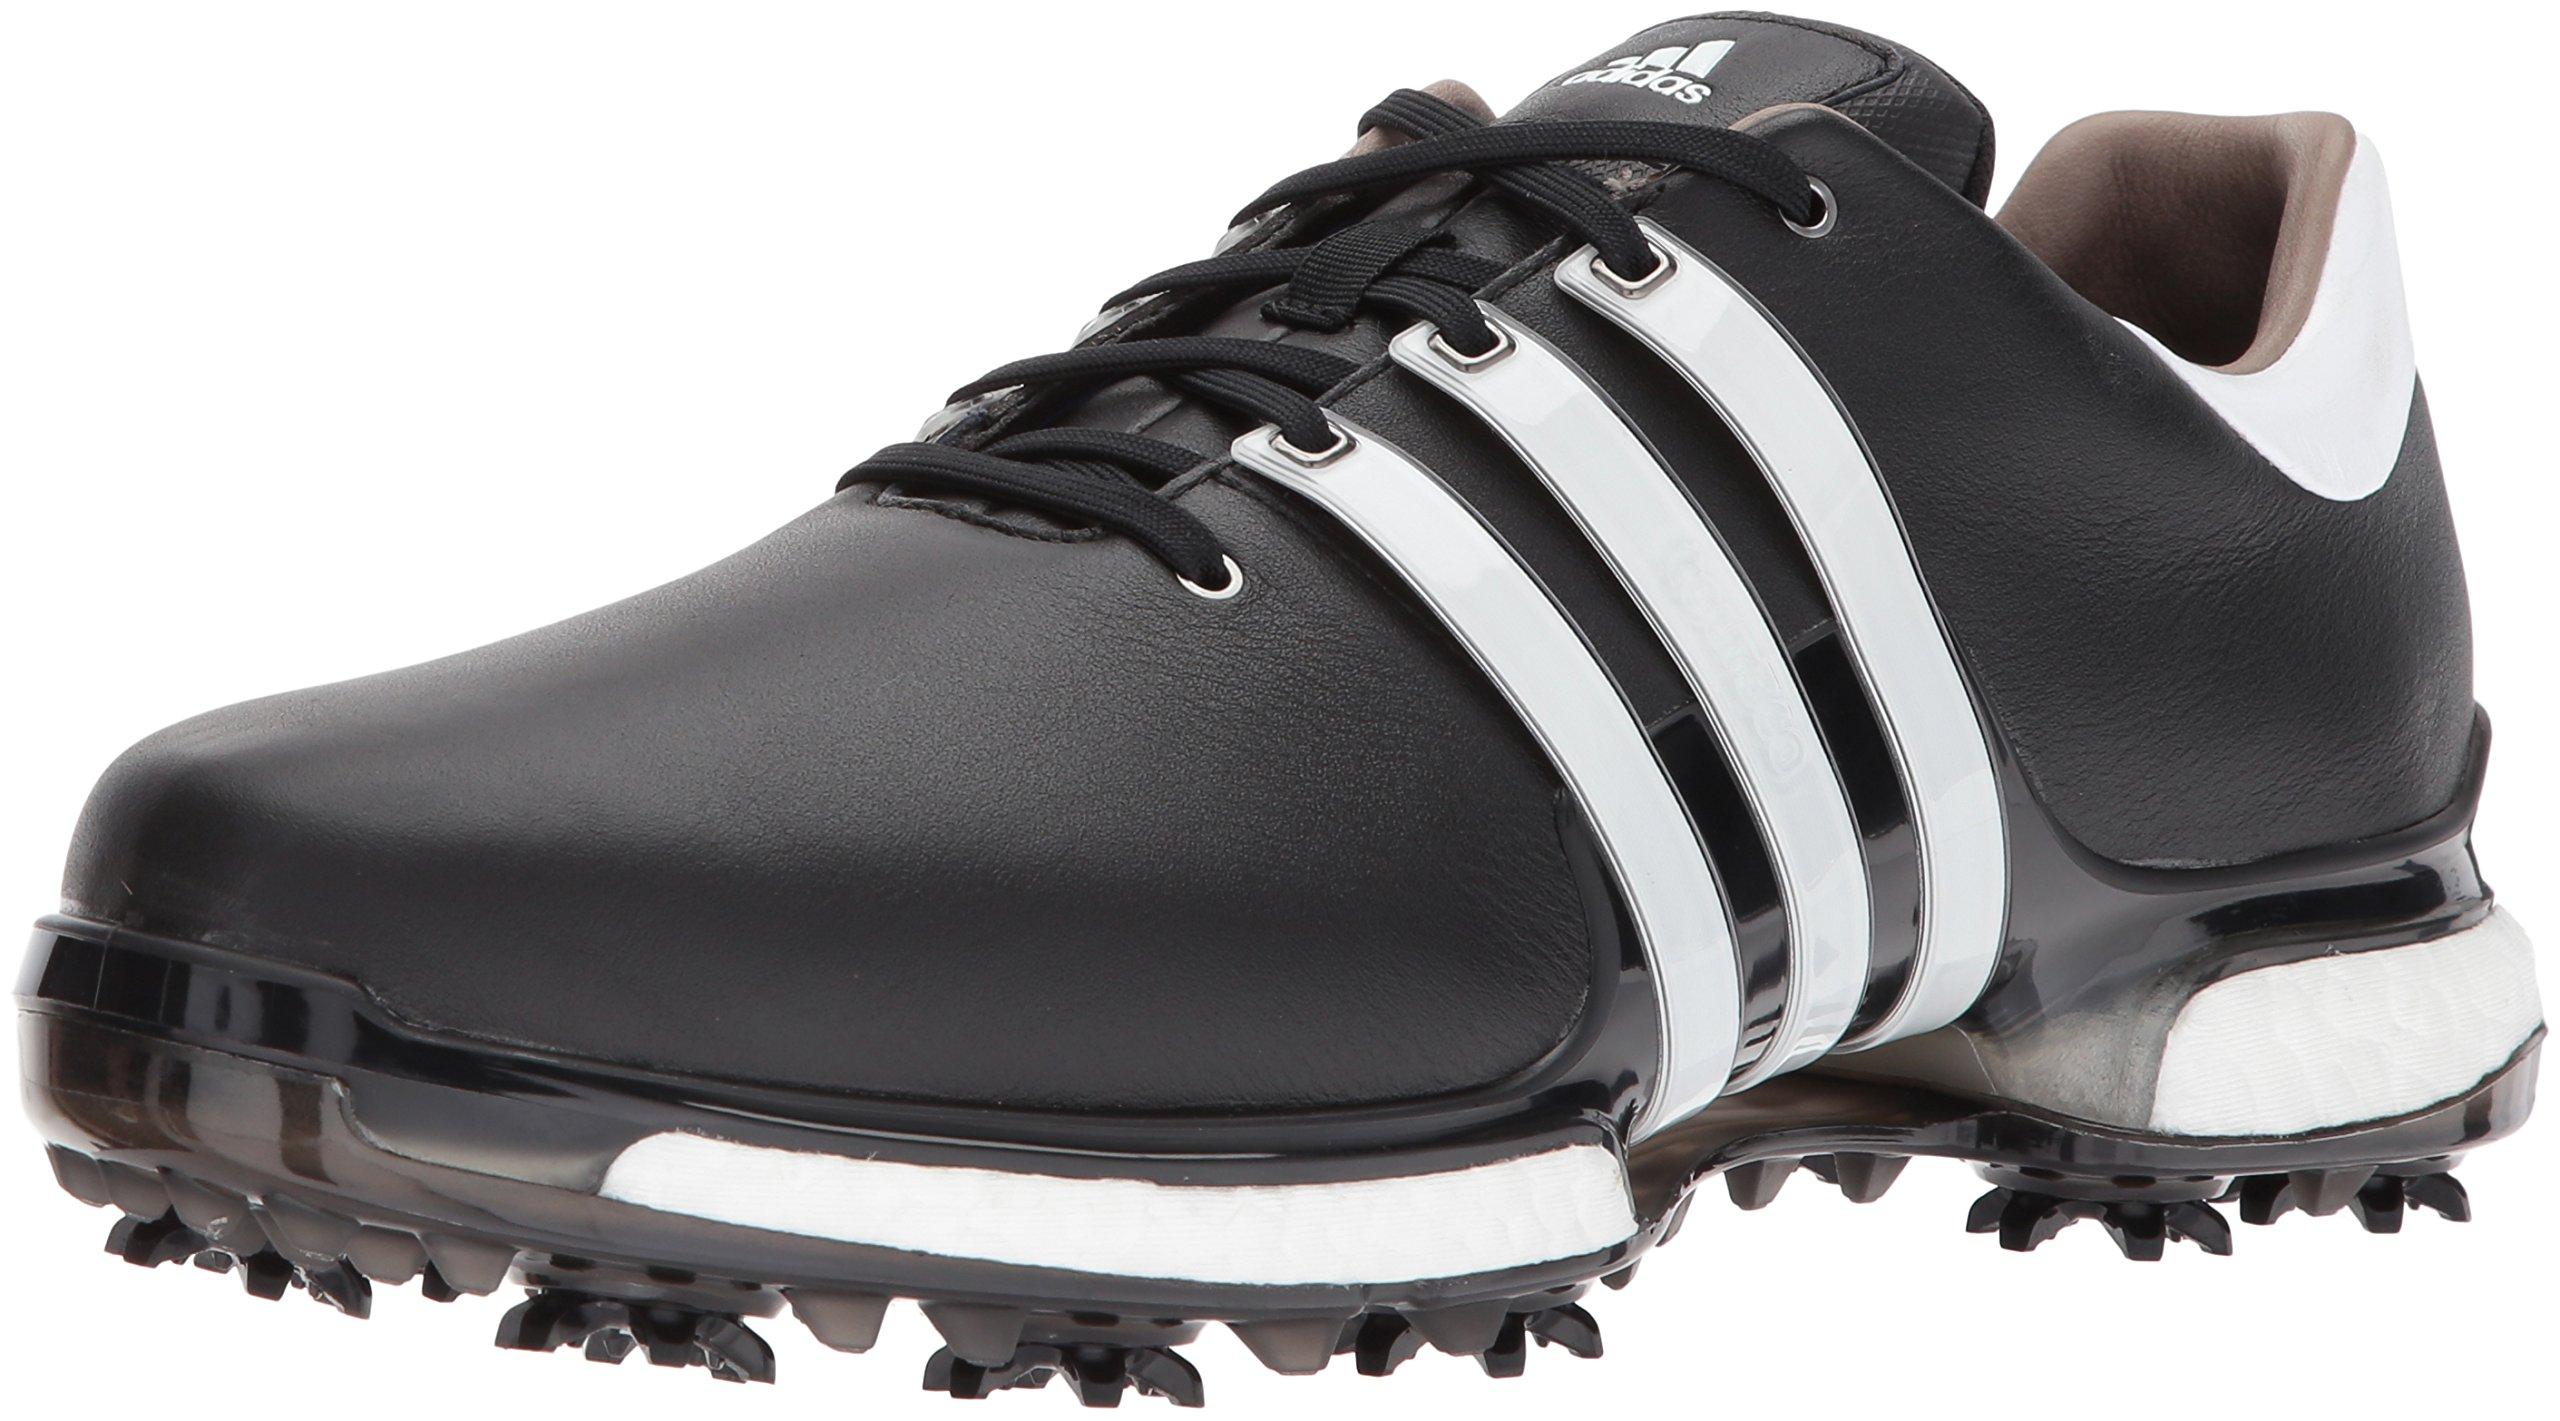 adidas Men's TOUR 360 2.0 Golf Shoe, Core Black/White, 12 M US by adidas